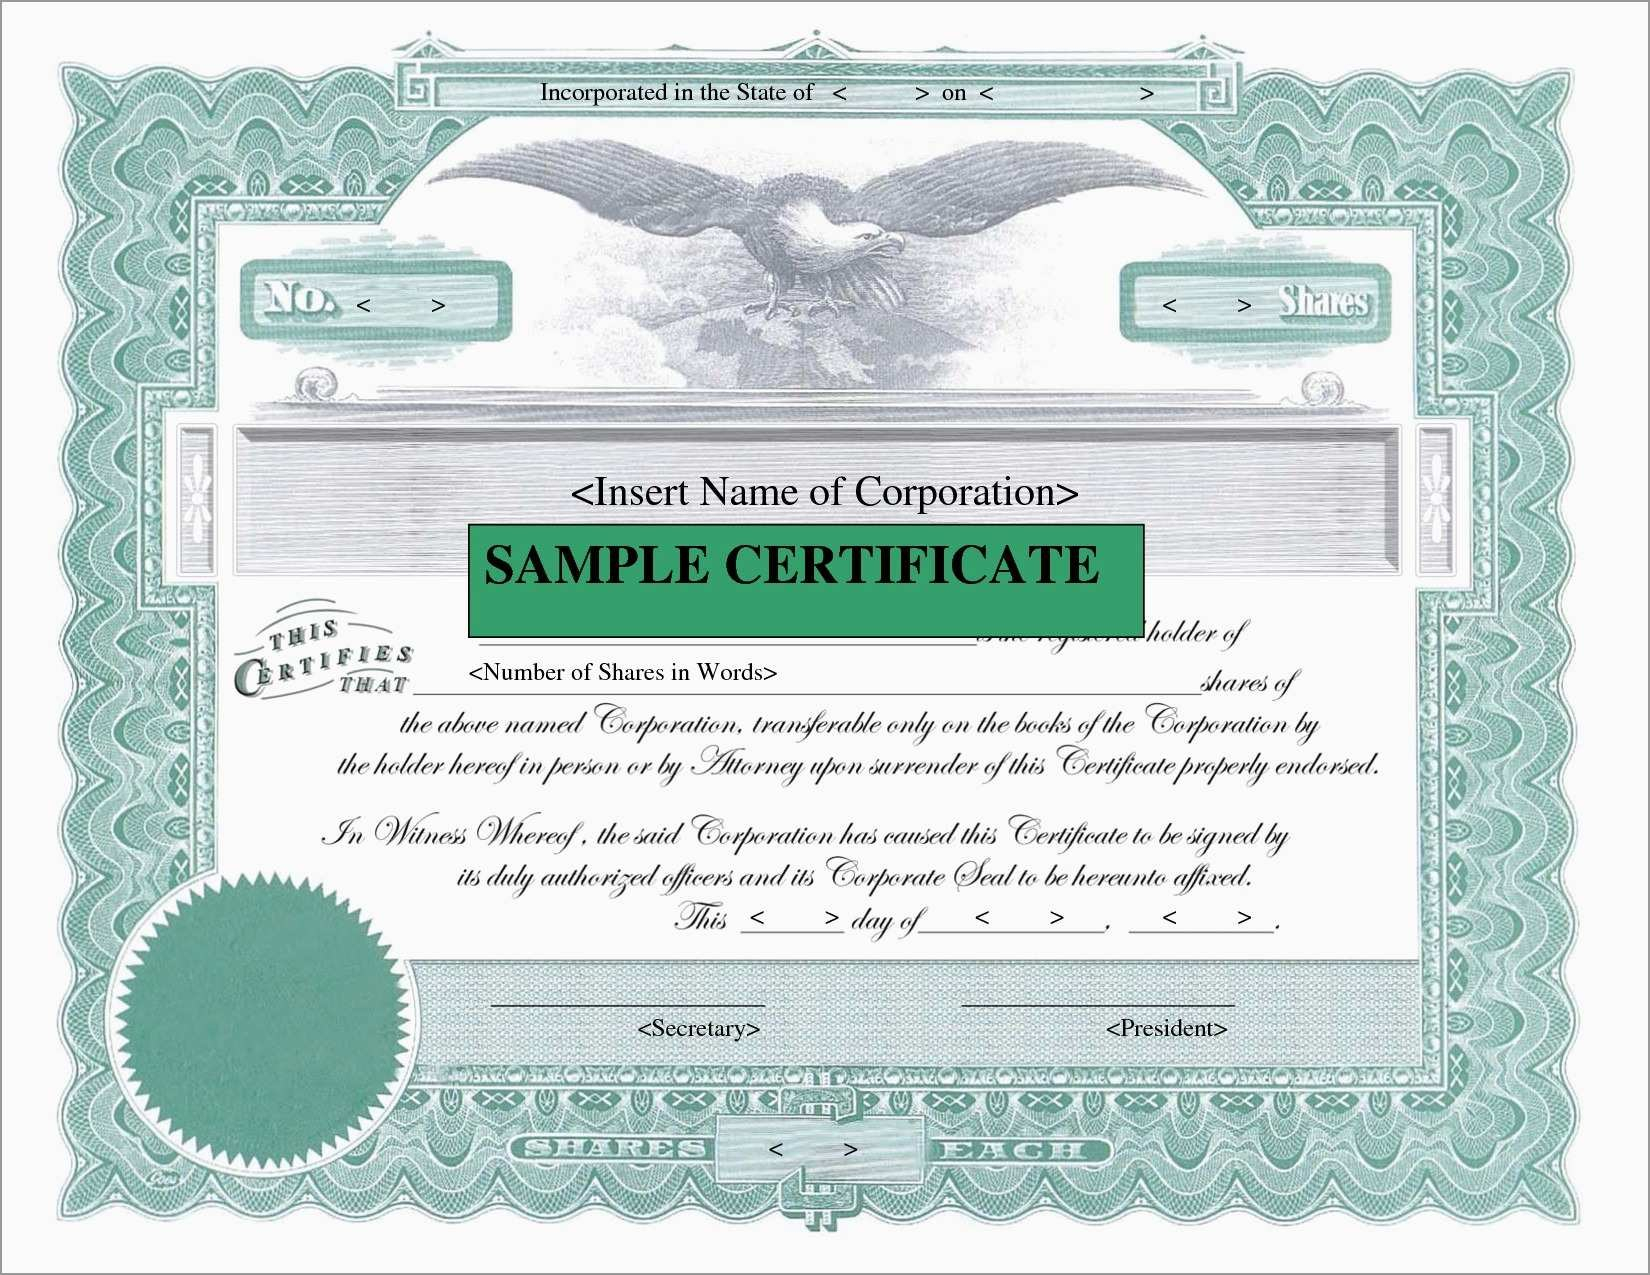 Corporate Stock Certificates Template Free Lovely Downloadable Stock Regarding Corporate Share Certificate Template